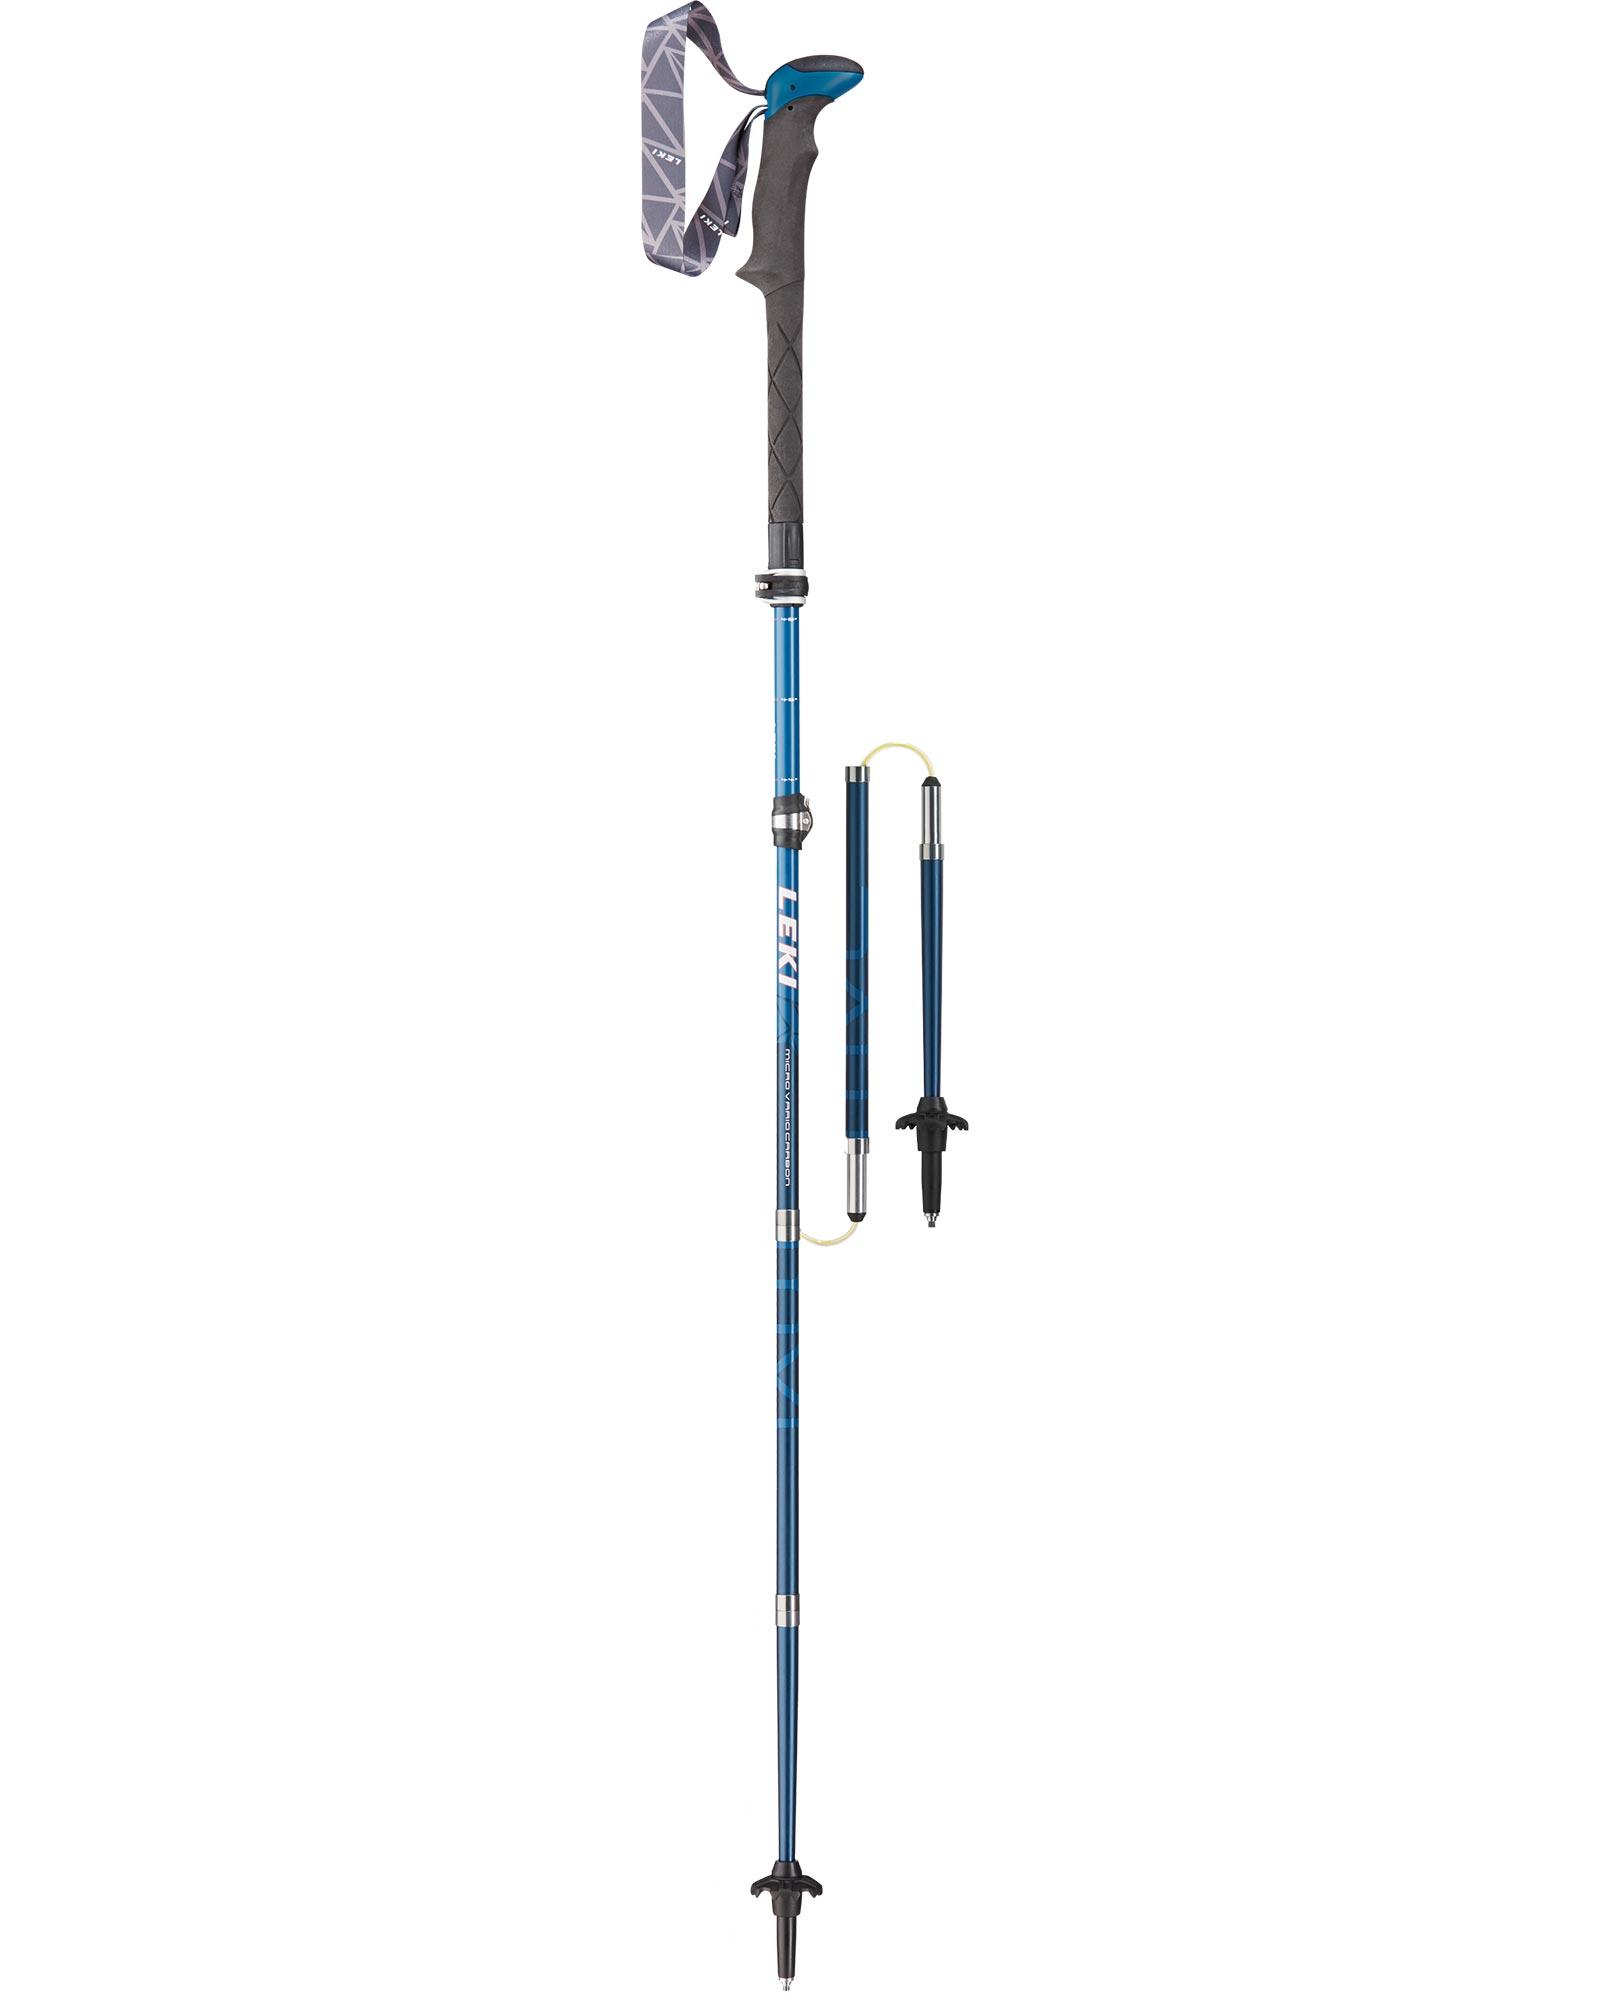 Leki Micro Vario Carbon Poles (Pair) 0